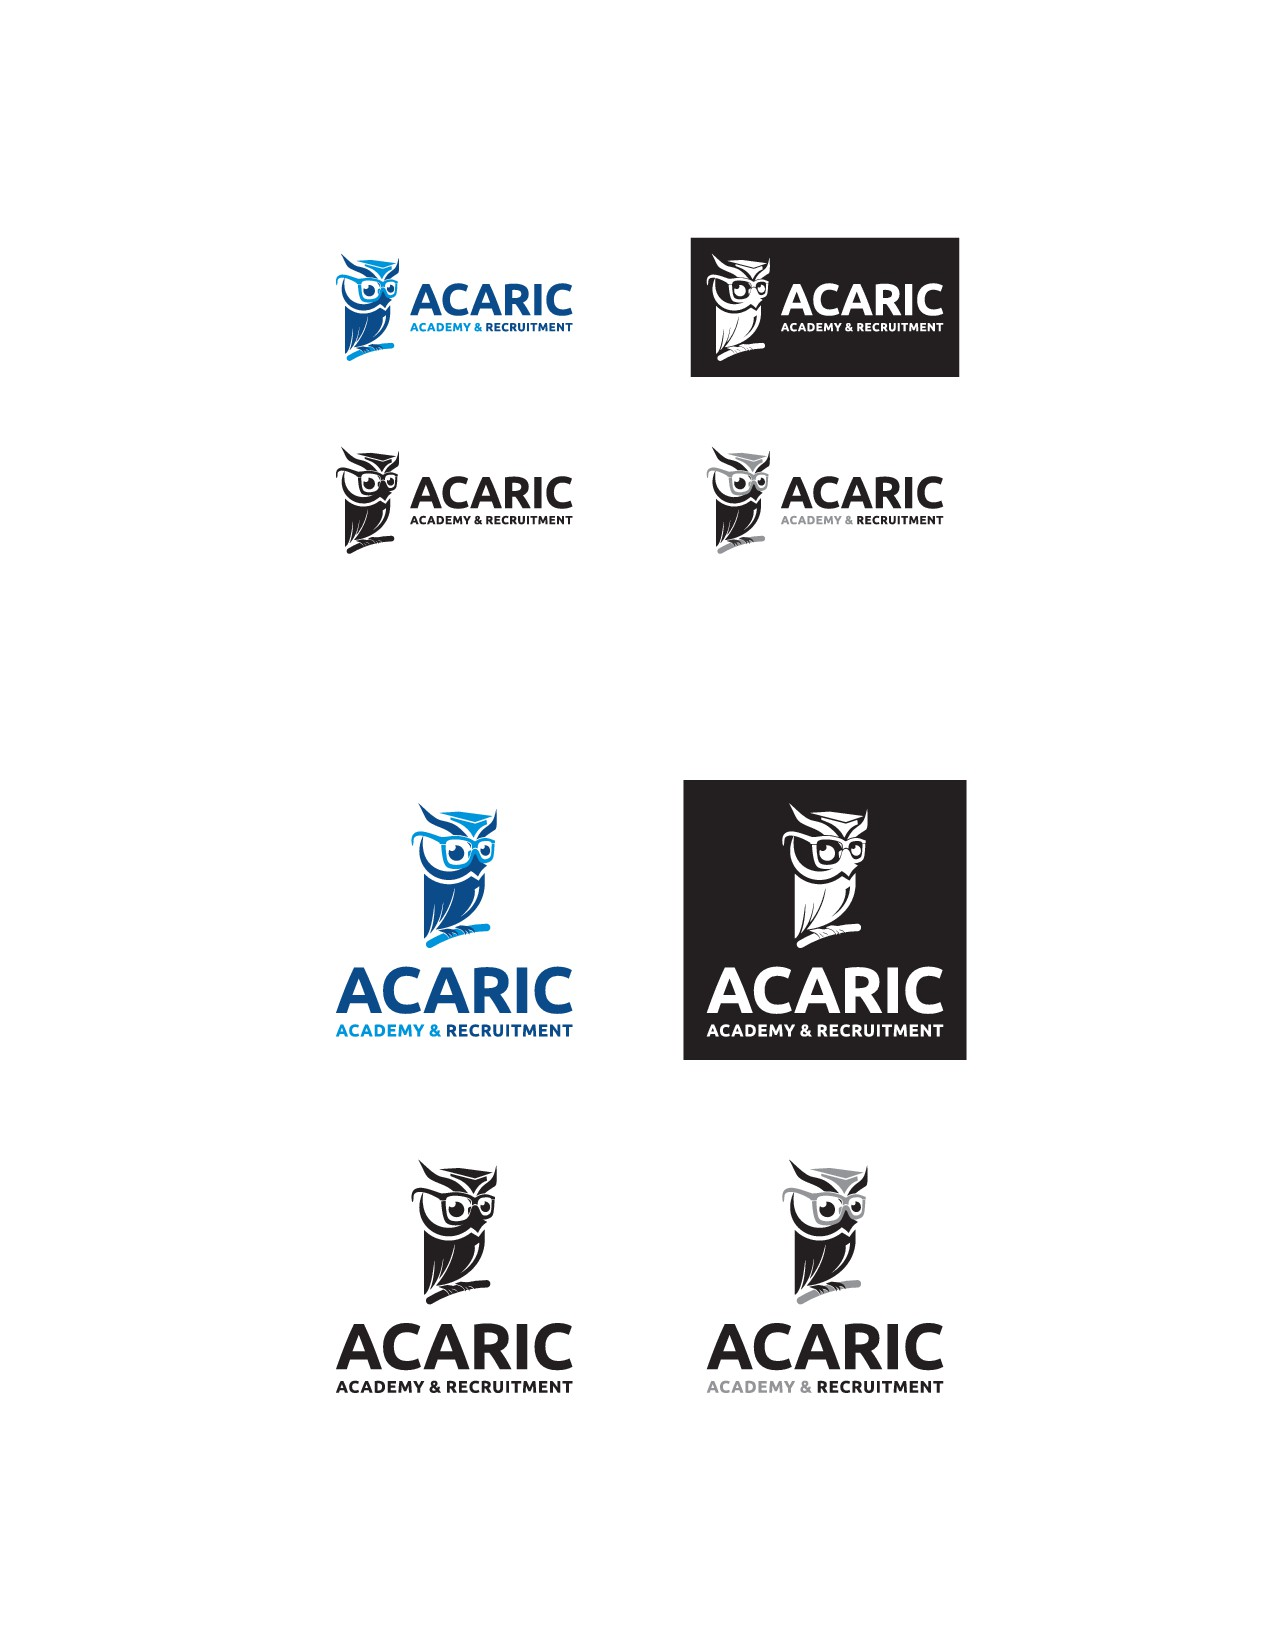 Modern and Geometric Logo Design for a Recruitment Agency/ 設立10年迎えた株式会社アカリクのために更なる進化を目指せるようなロゴをデザインしてください。